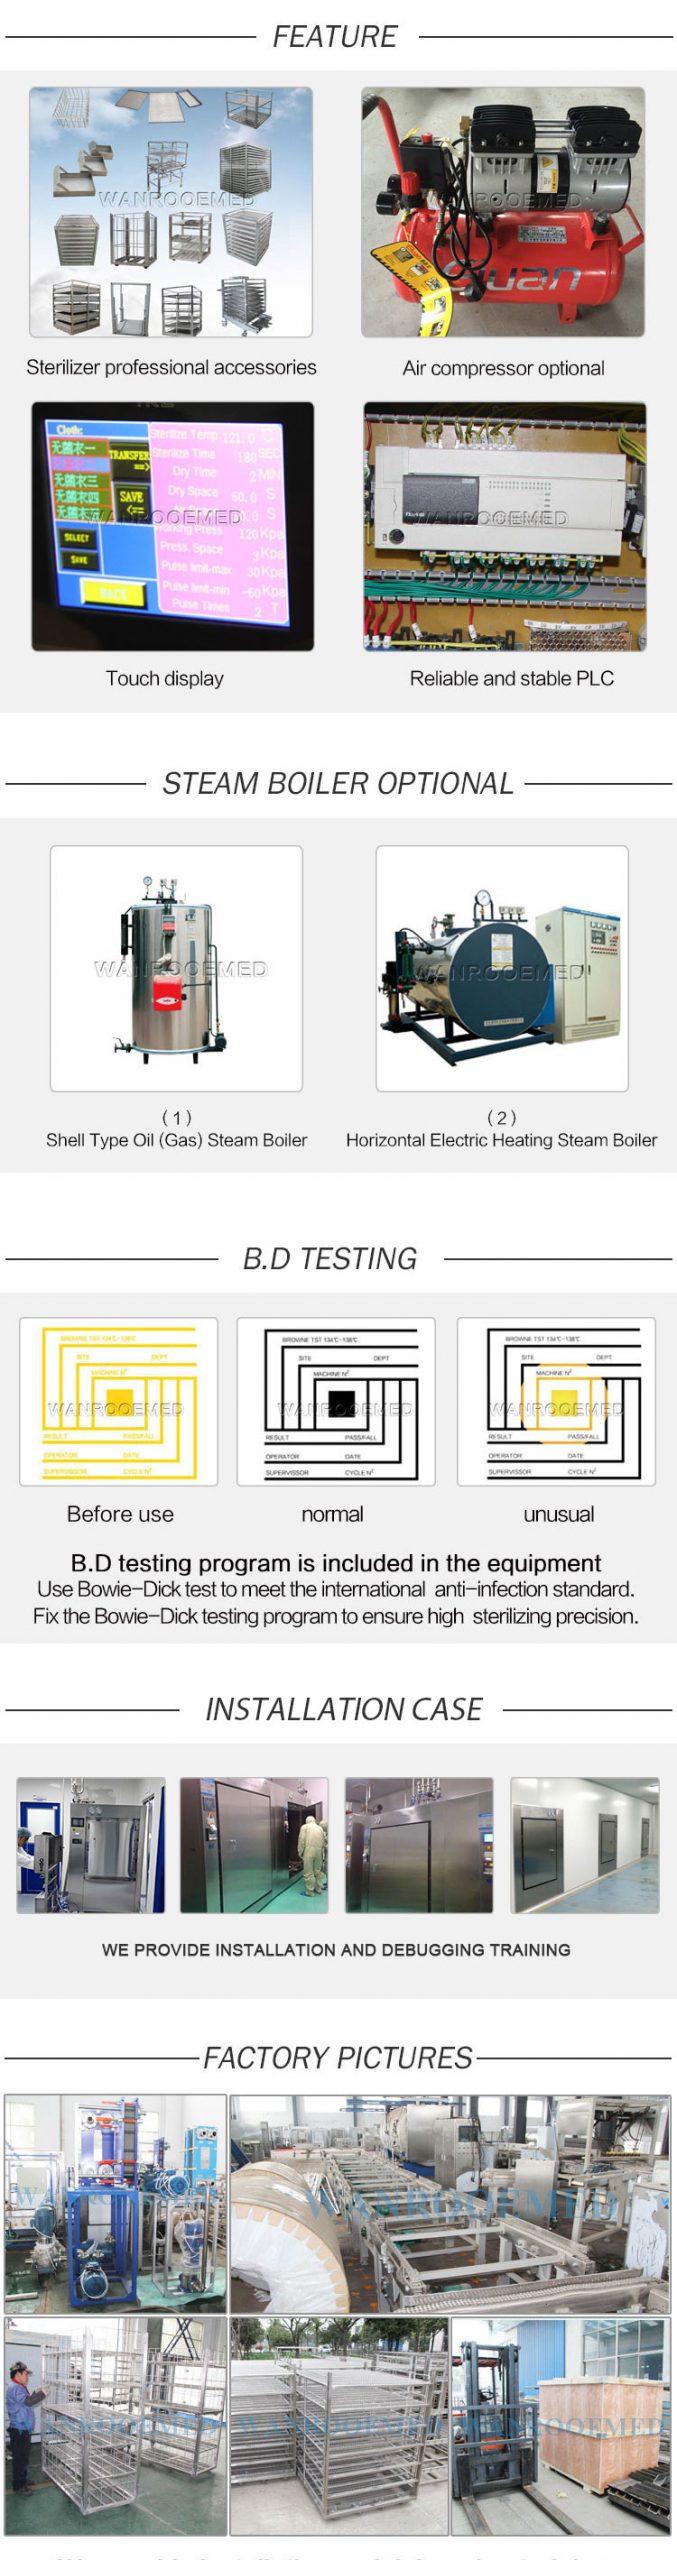 Steam Sterilizer, Vacuum Steam Sterilizer, Vertical Autoclave, Vacuum Autoclave, Hospital Autoclave